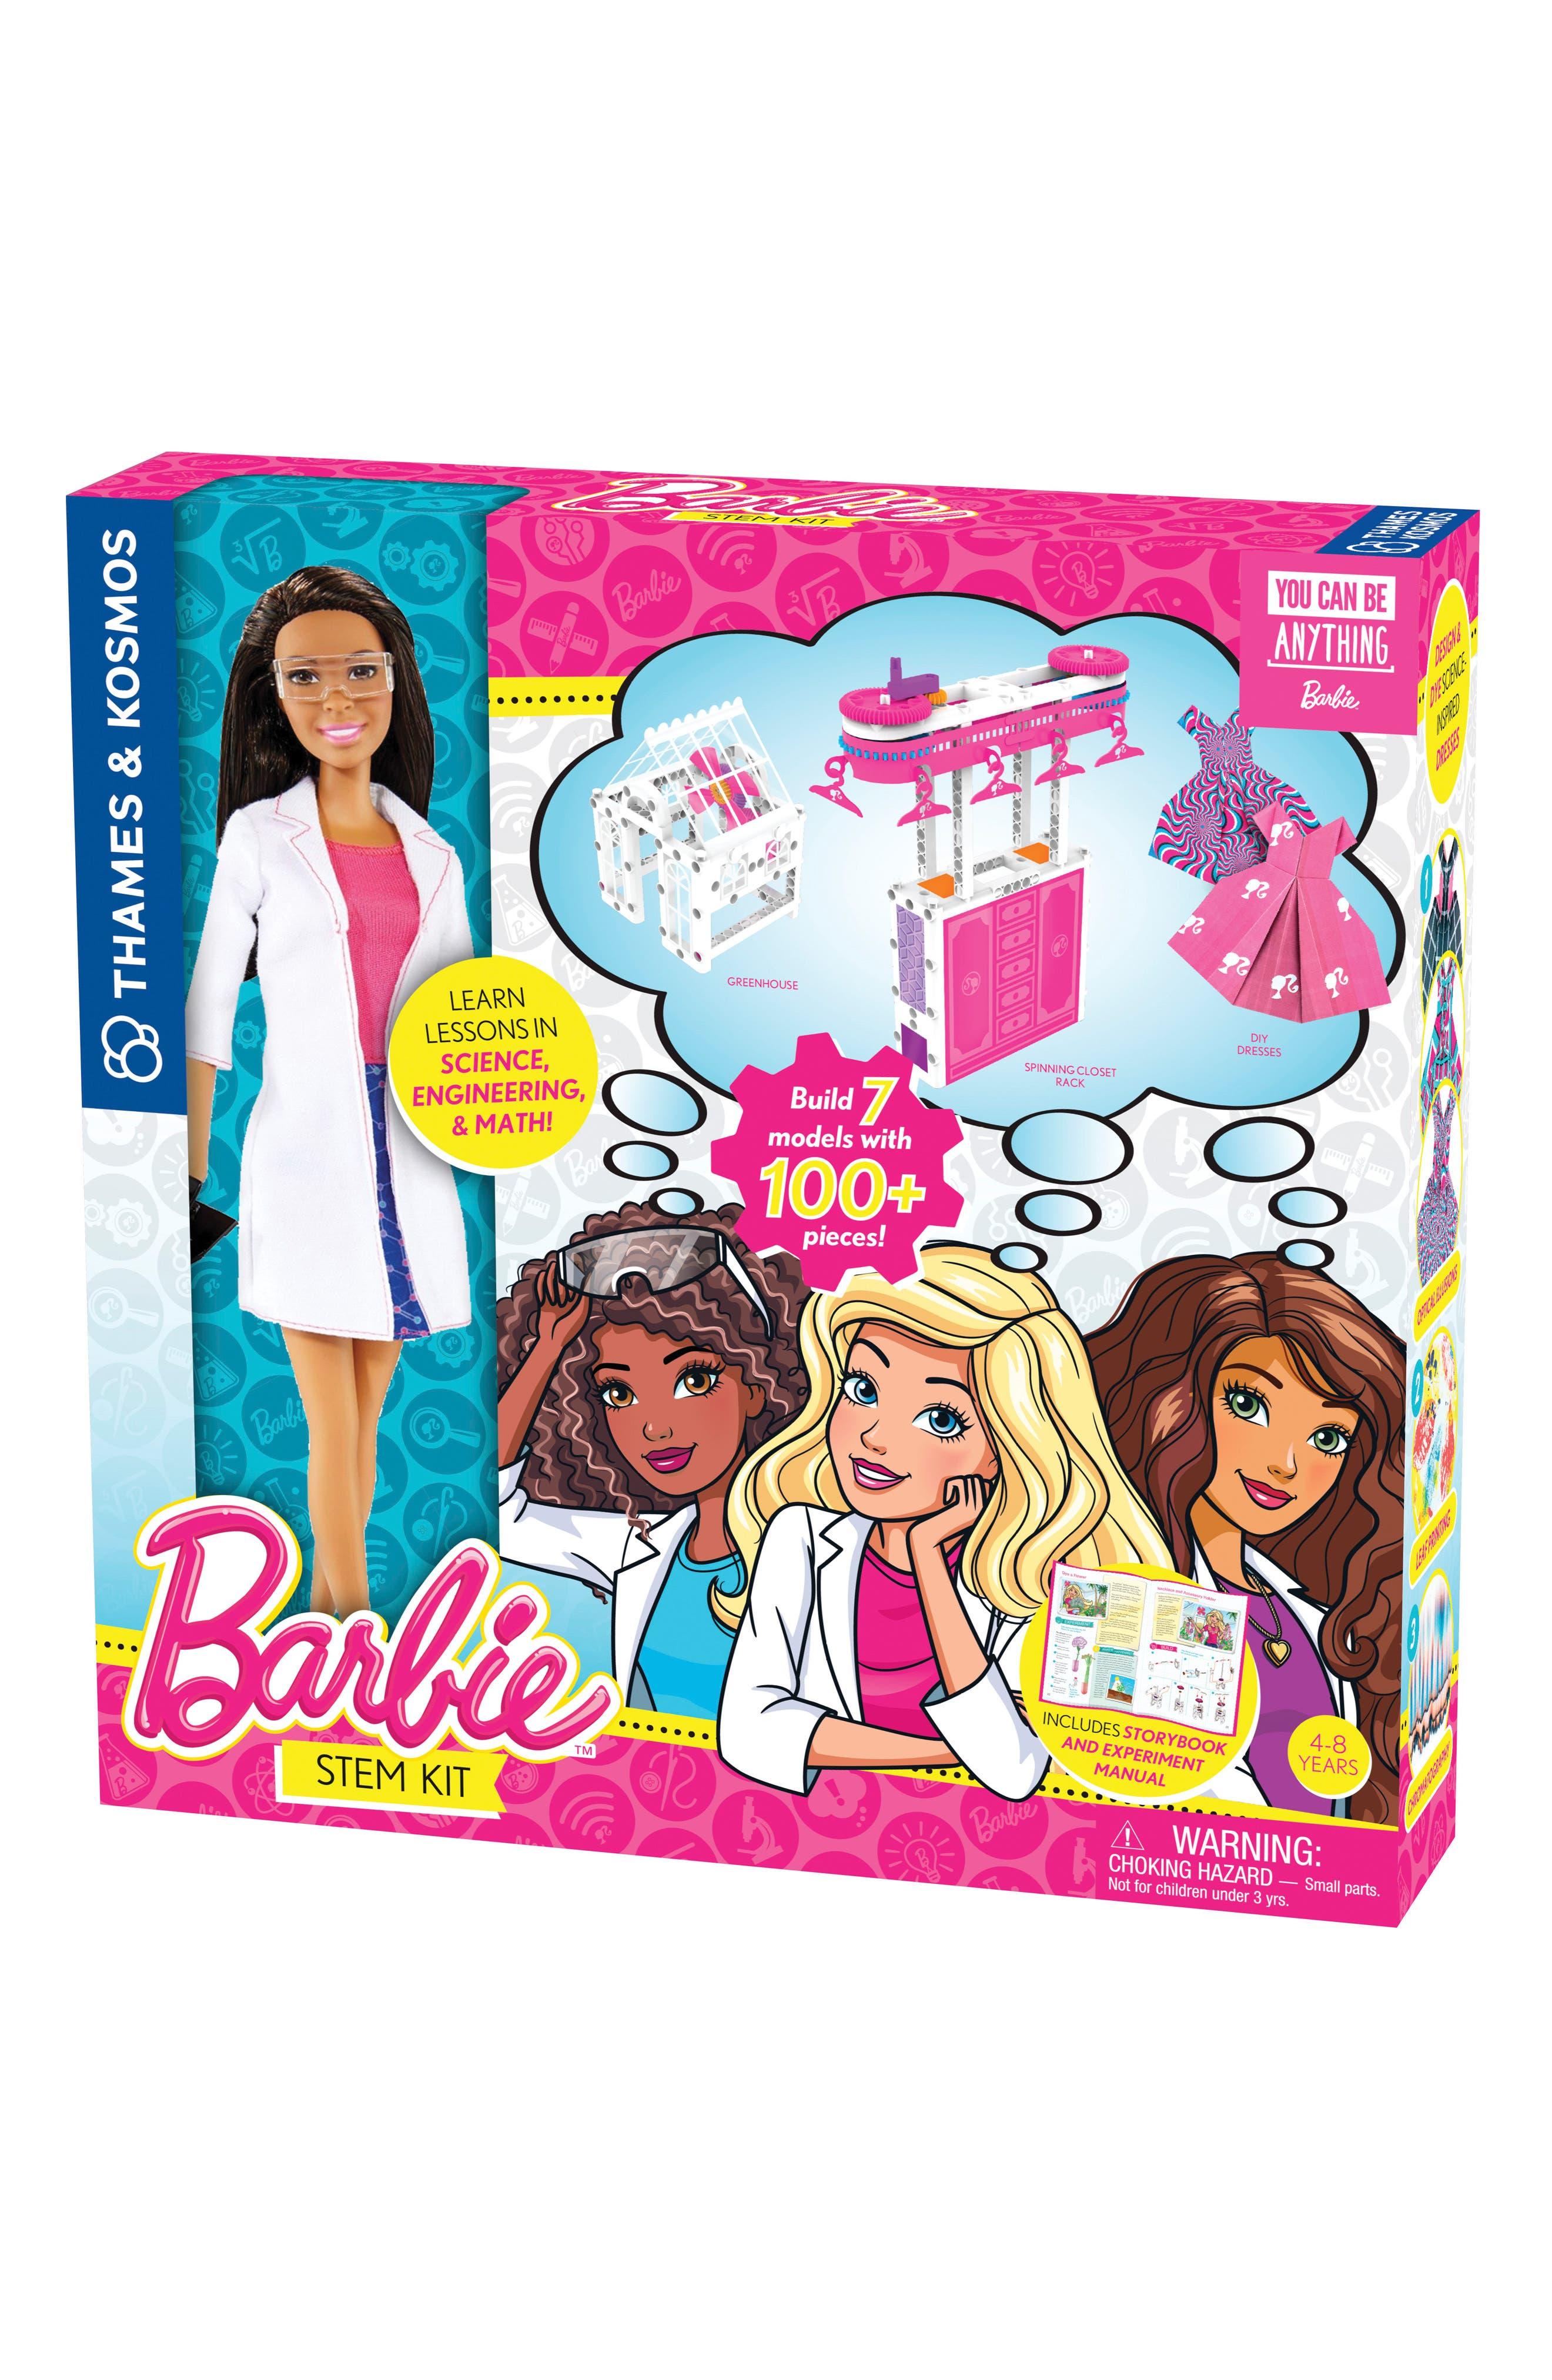 Barbie<sup>®</sup> Nikki STEM Kit & Doll Set,                             Main thumbnail 1, color,                             PINK